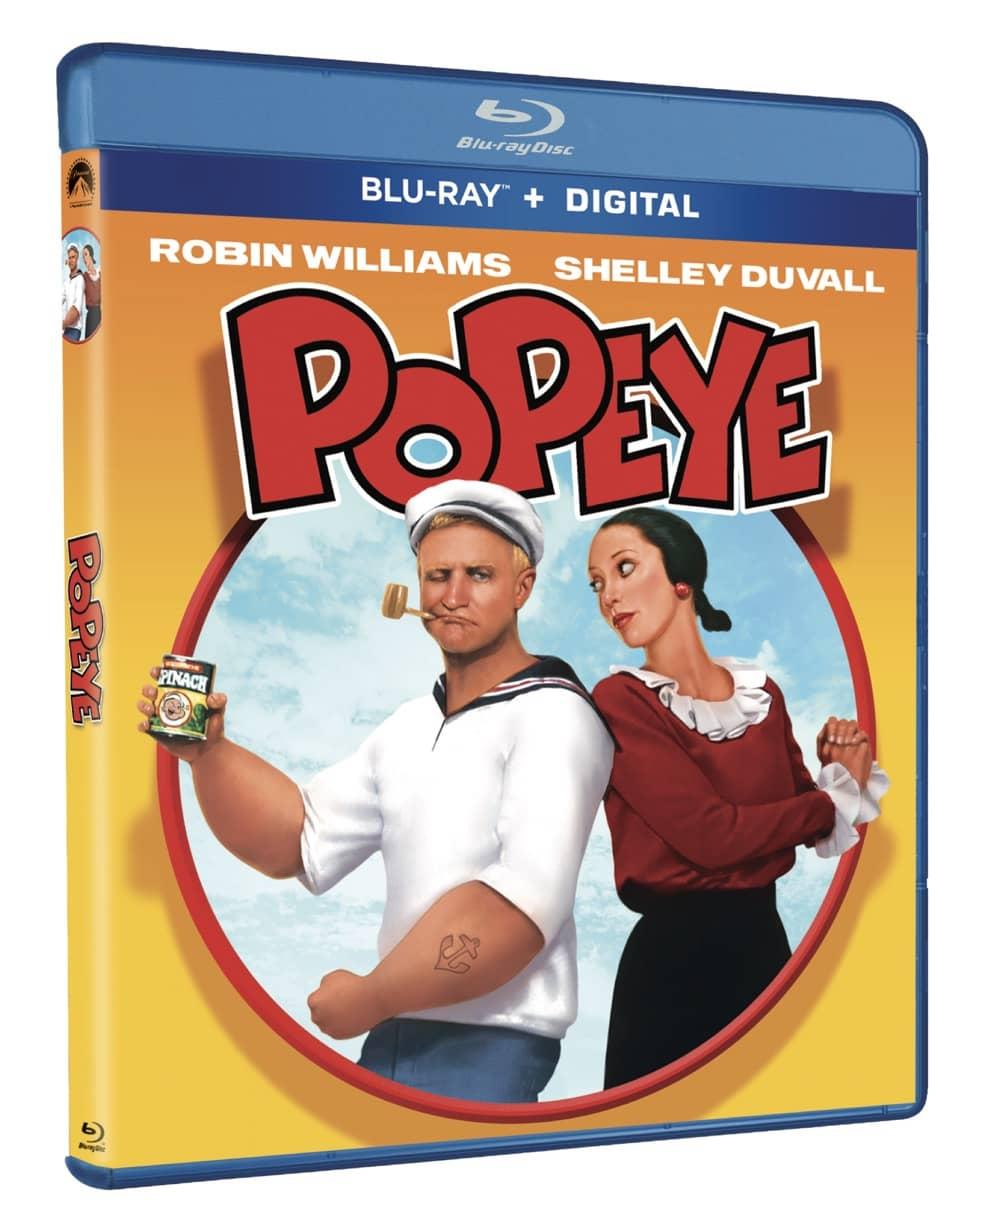 Popeye Blu-ray Cover 40th Anniversary